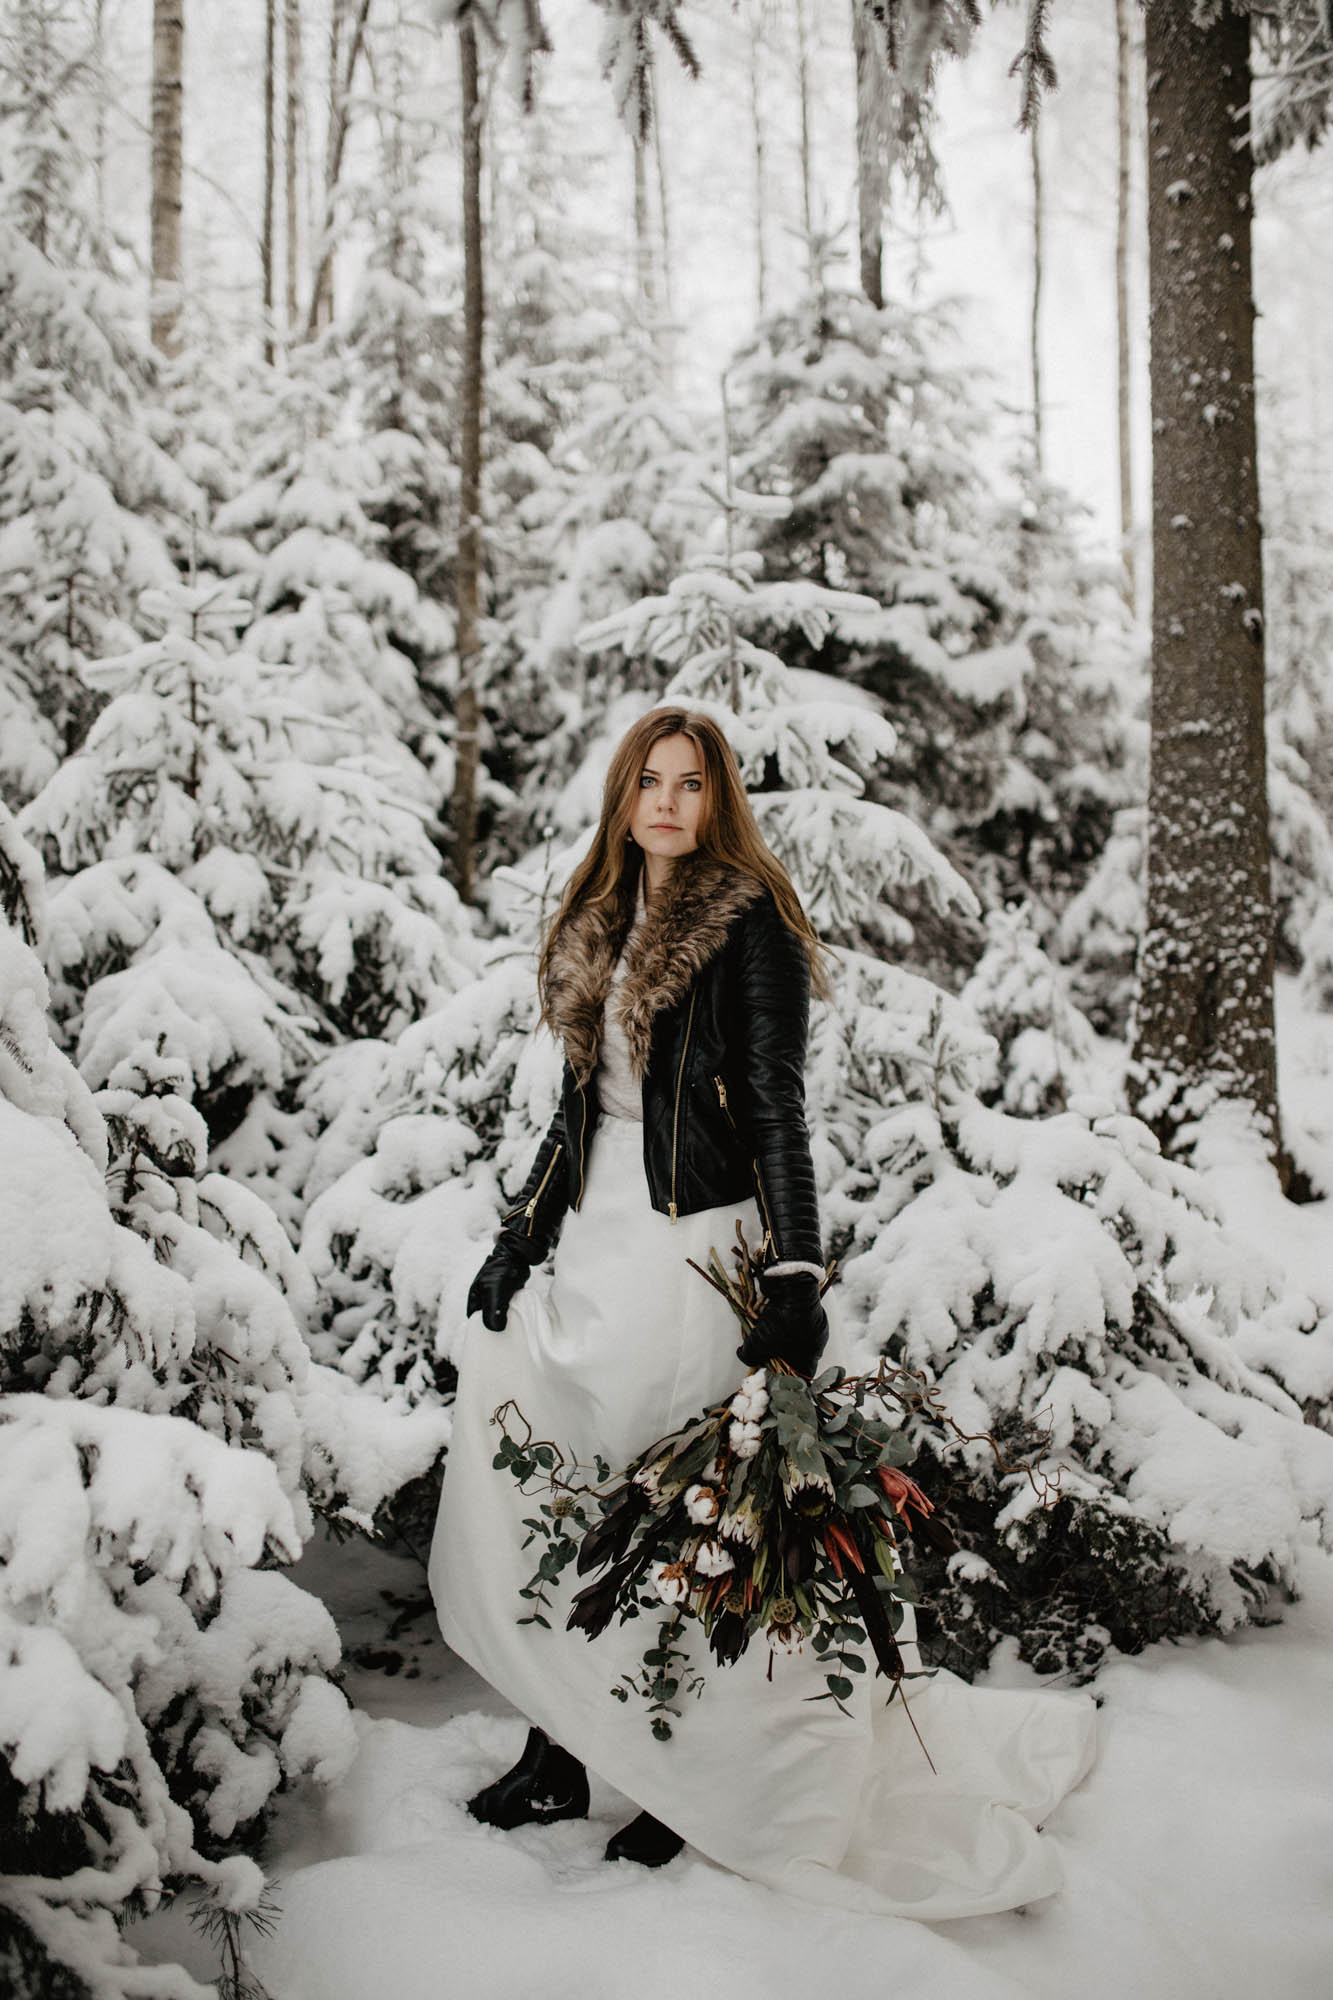 ashley_schulman_photography-winter_wedding_tampere-19.jpg